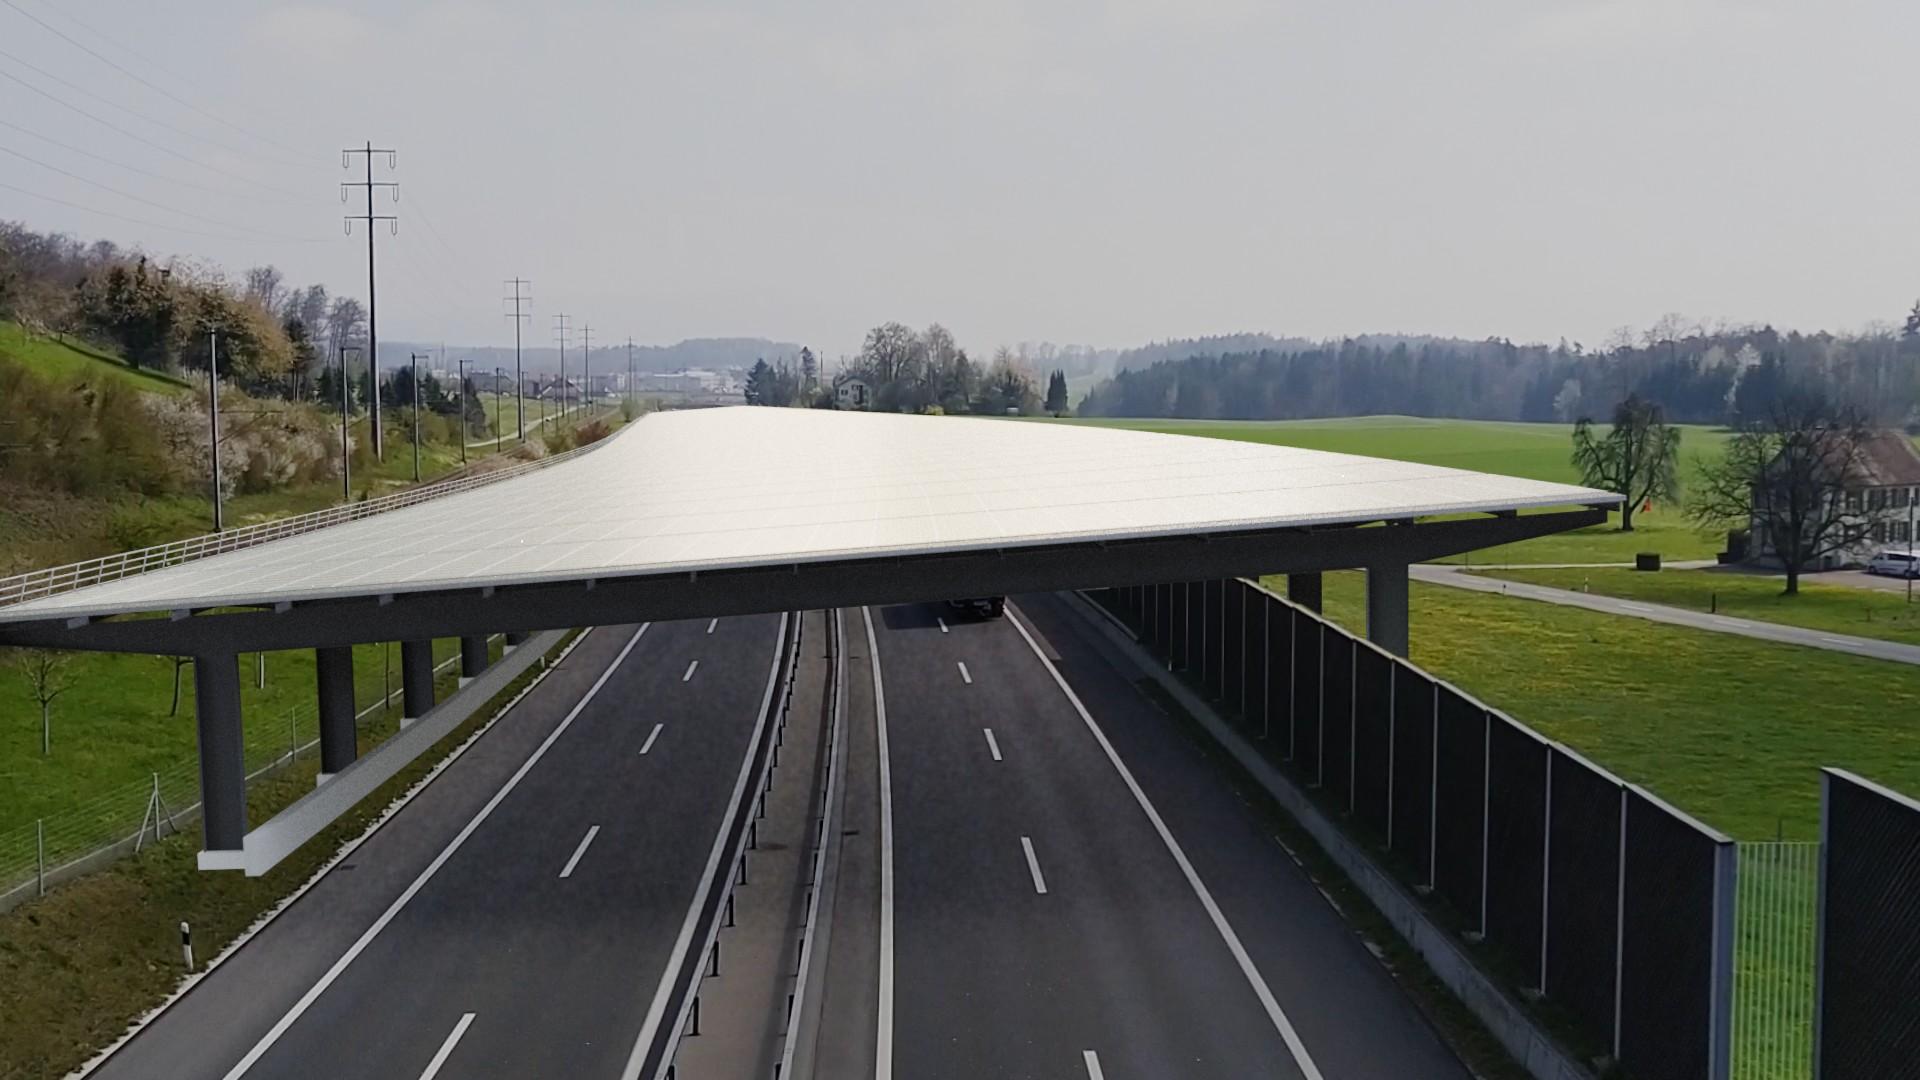 autoroute-knonau-renders-images-5.4